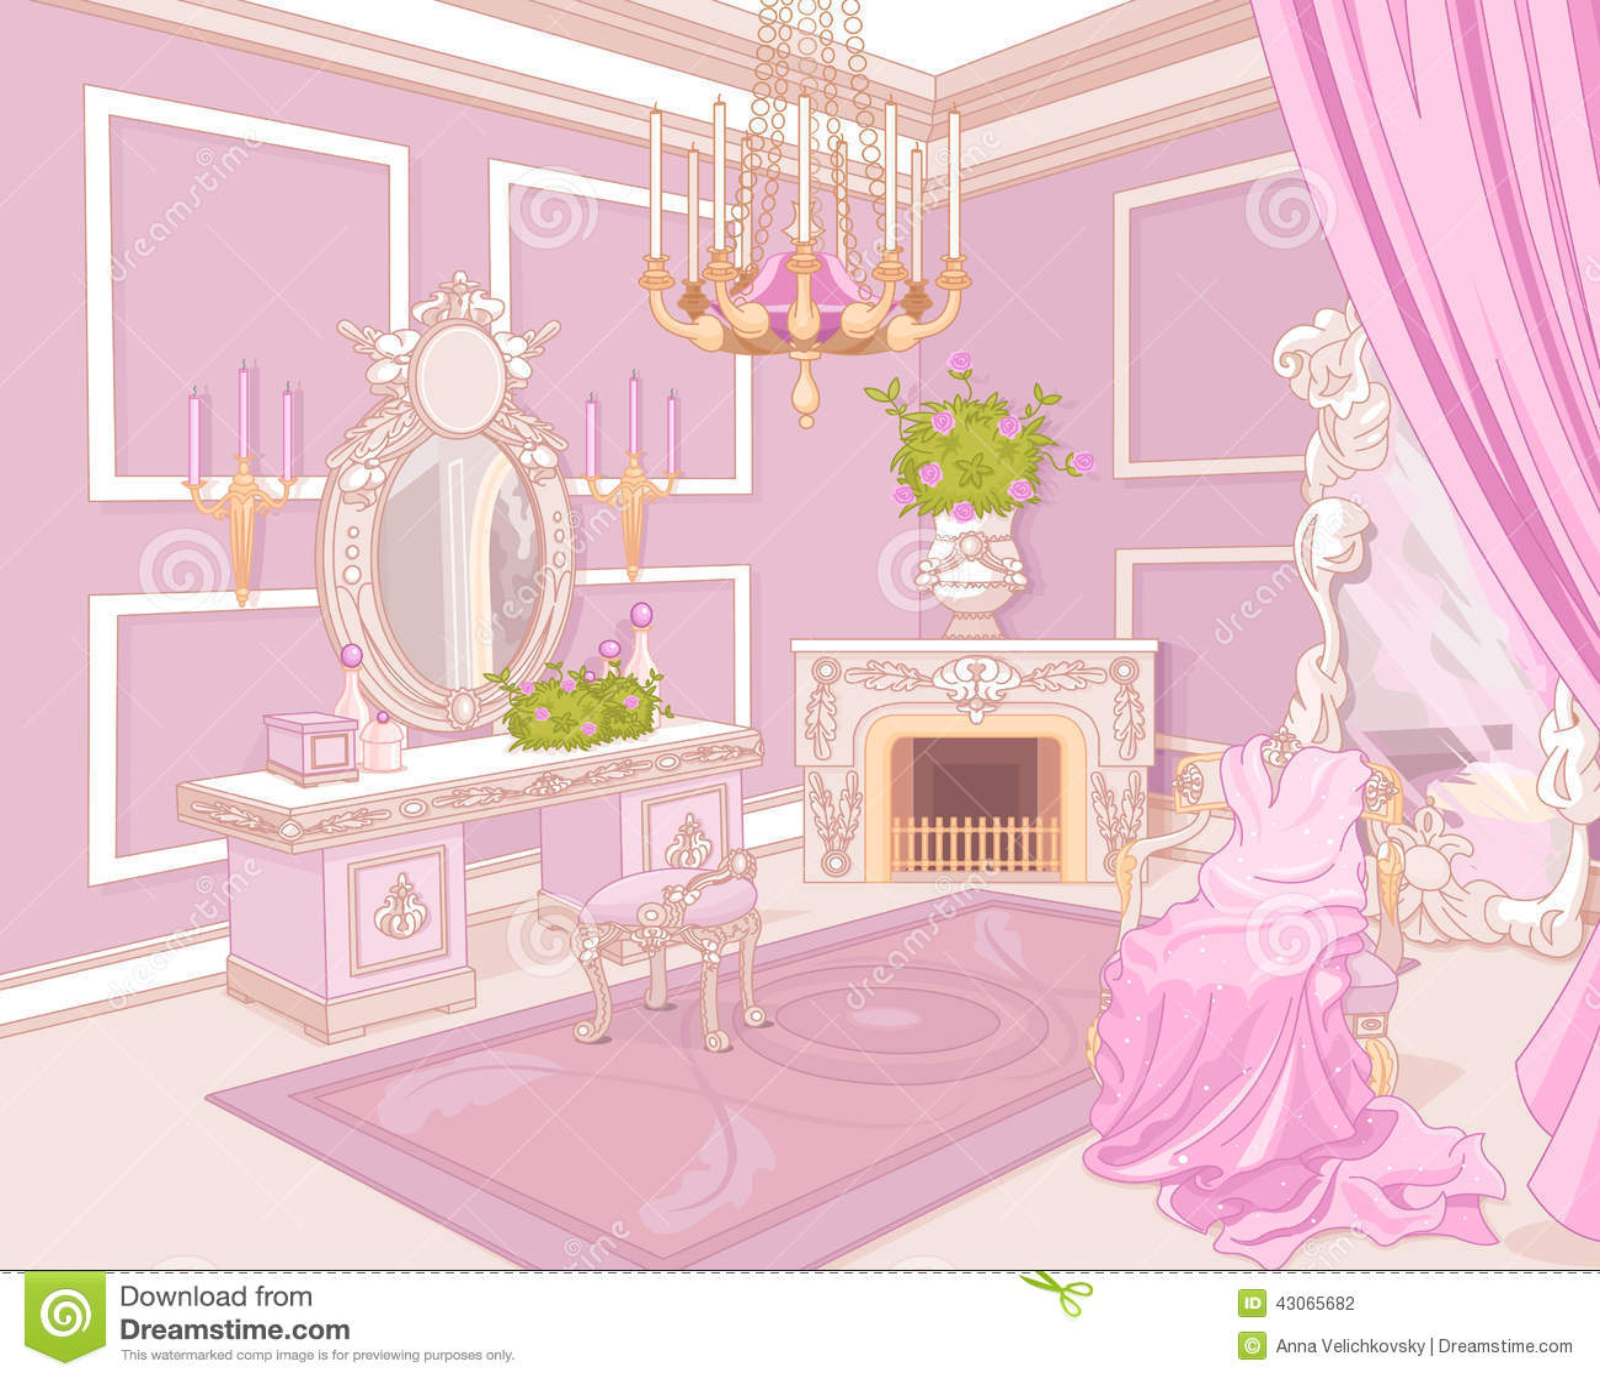 Prinseskleedkamer